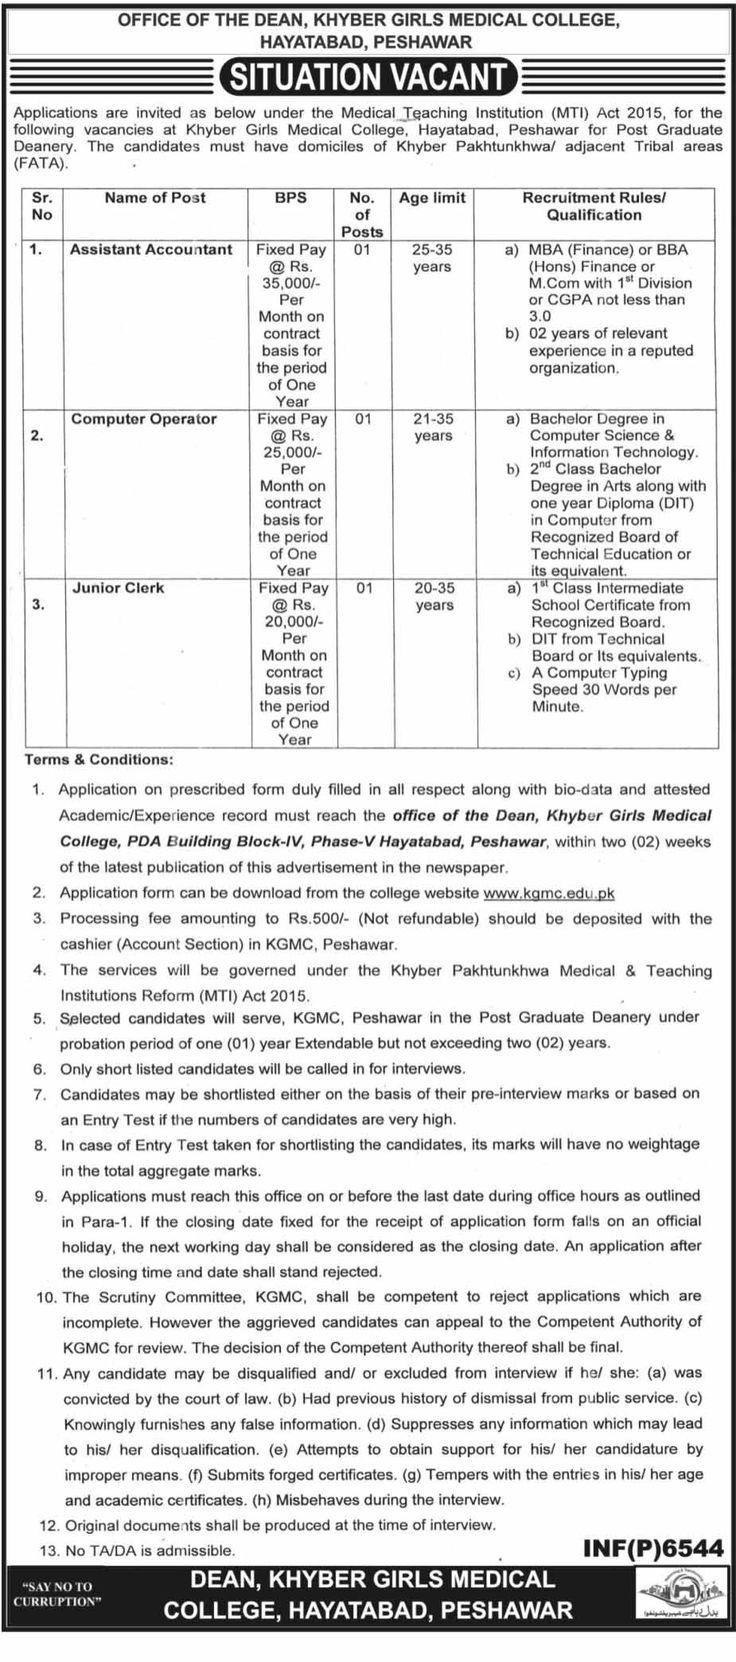 Khyber Girls Medical College Jobs 2017 In Peshawar For Junior Clerk And Computer Operator http://www.jobsfanda.com/khyber-girls-medical-college-jobs-2017-peshawar-junior-clerk-computer-operator/